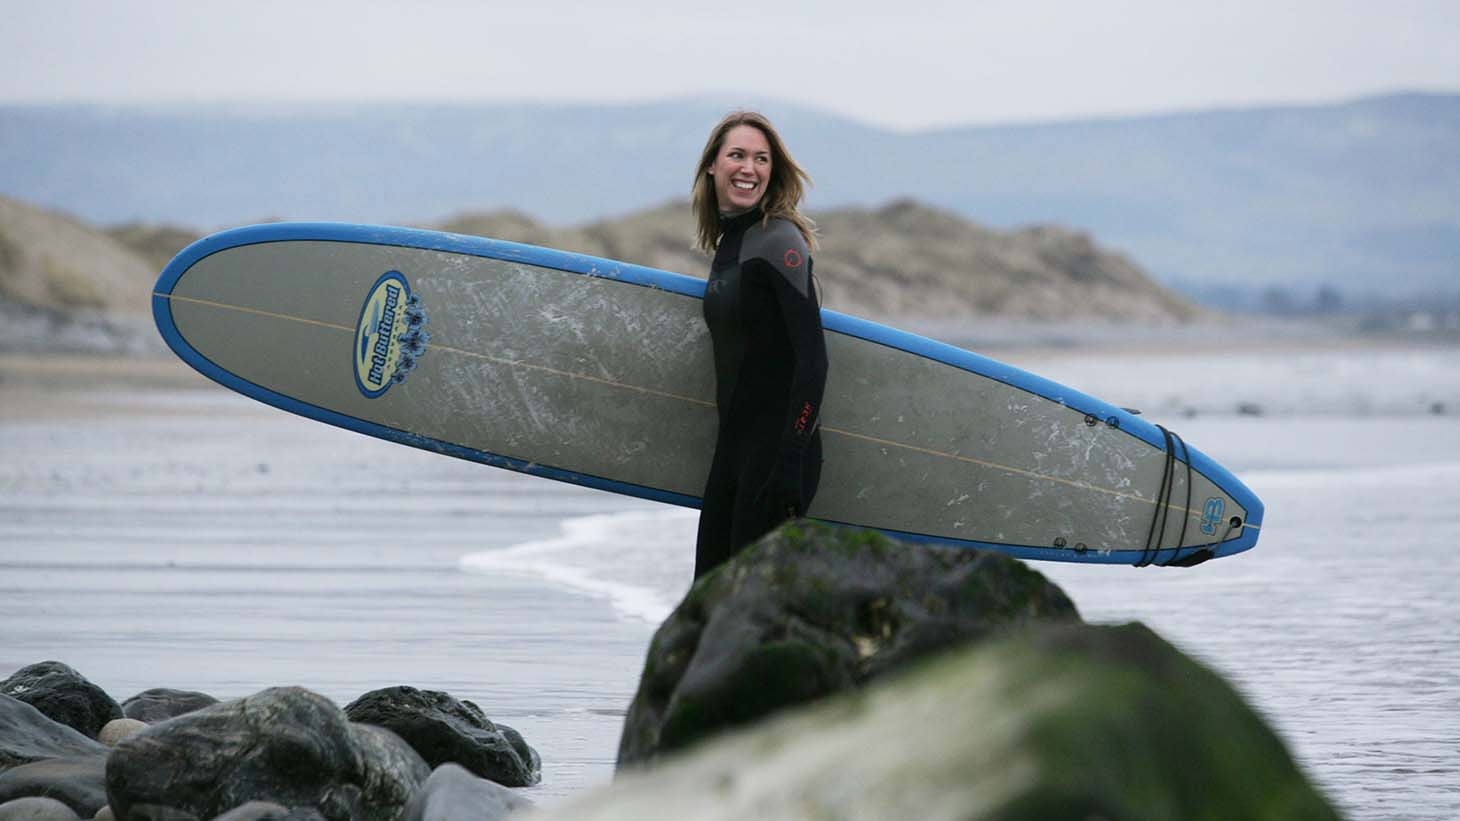 Enniscrone Beach is the ideal destination for the beginner surfer.